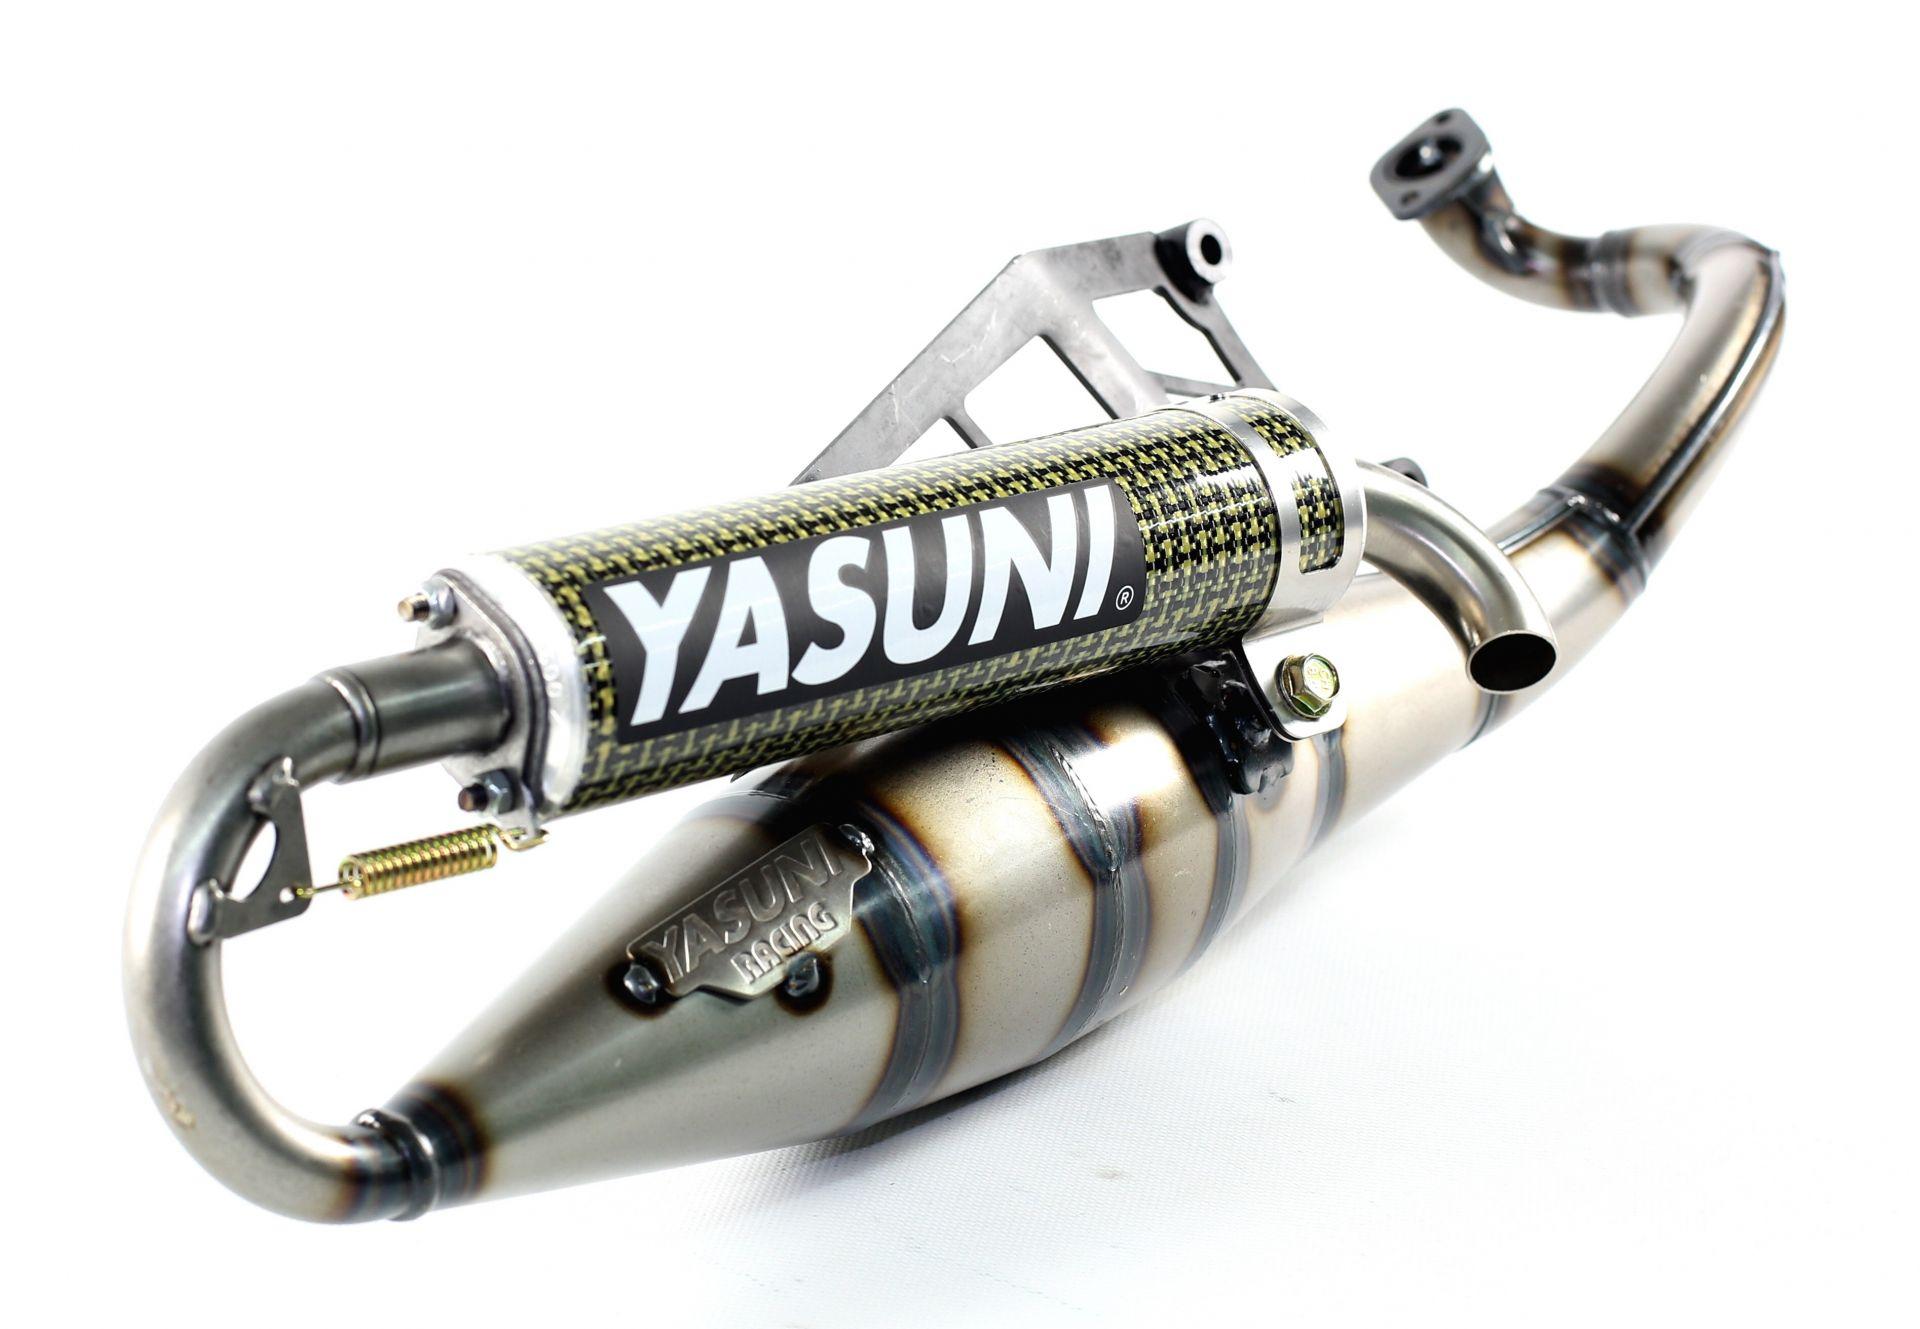 Pot d'échappement Yasuni R carbone/kevlar Katana/SR